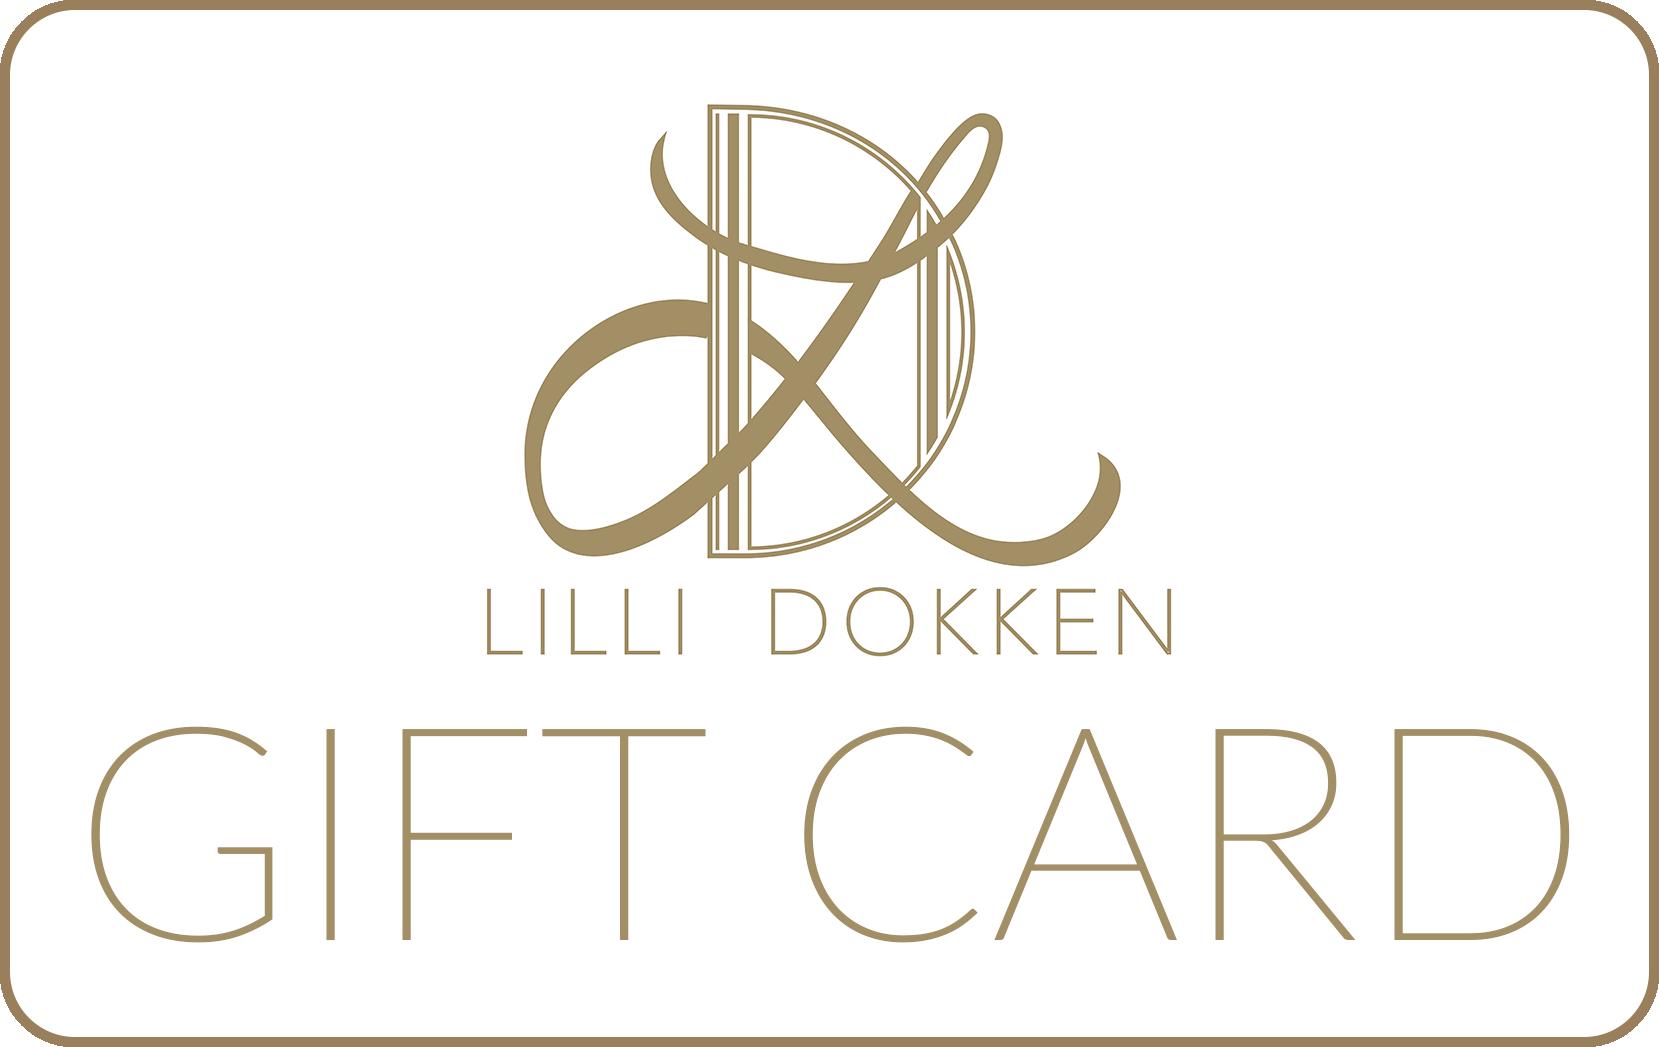 Lilli Dokken Gift Card